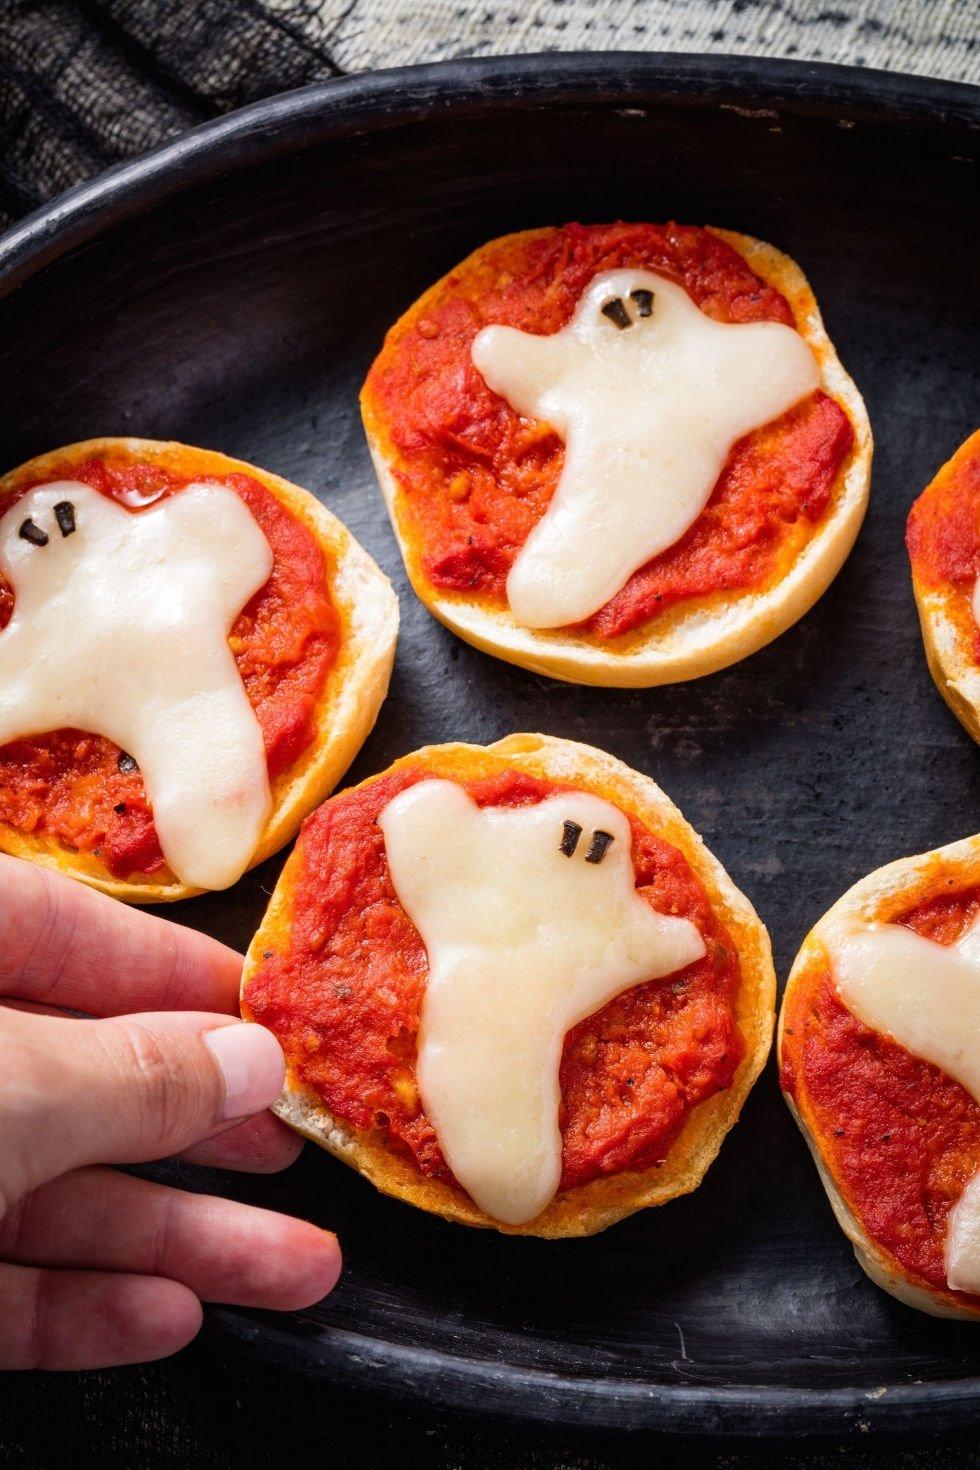 10 Awesome Halloween Baking Ideas For Kids halloween food ideas for kids mforum 5 2021